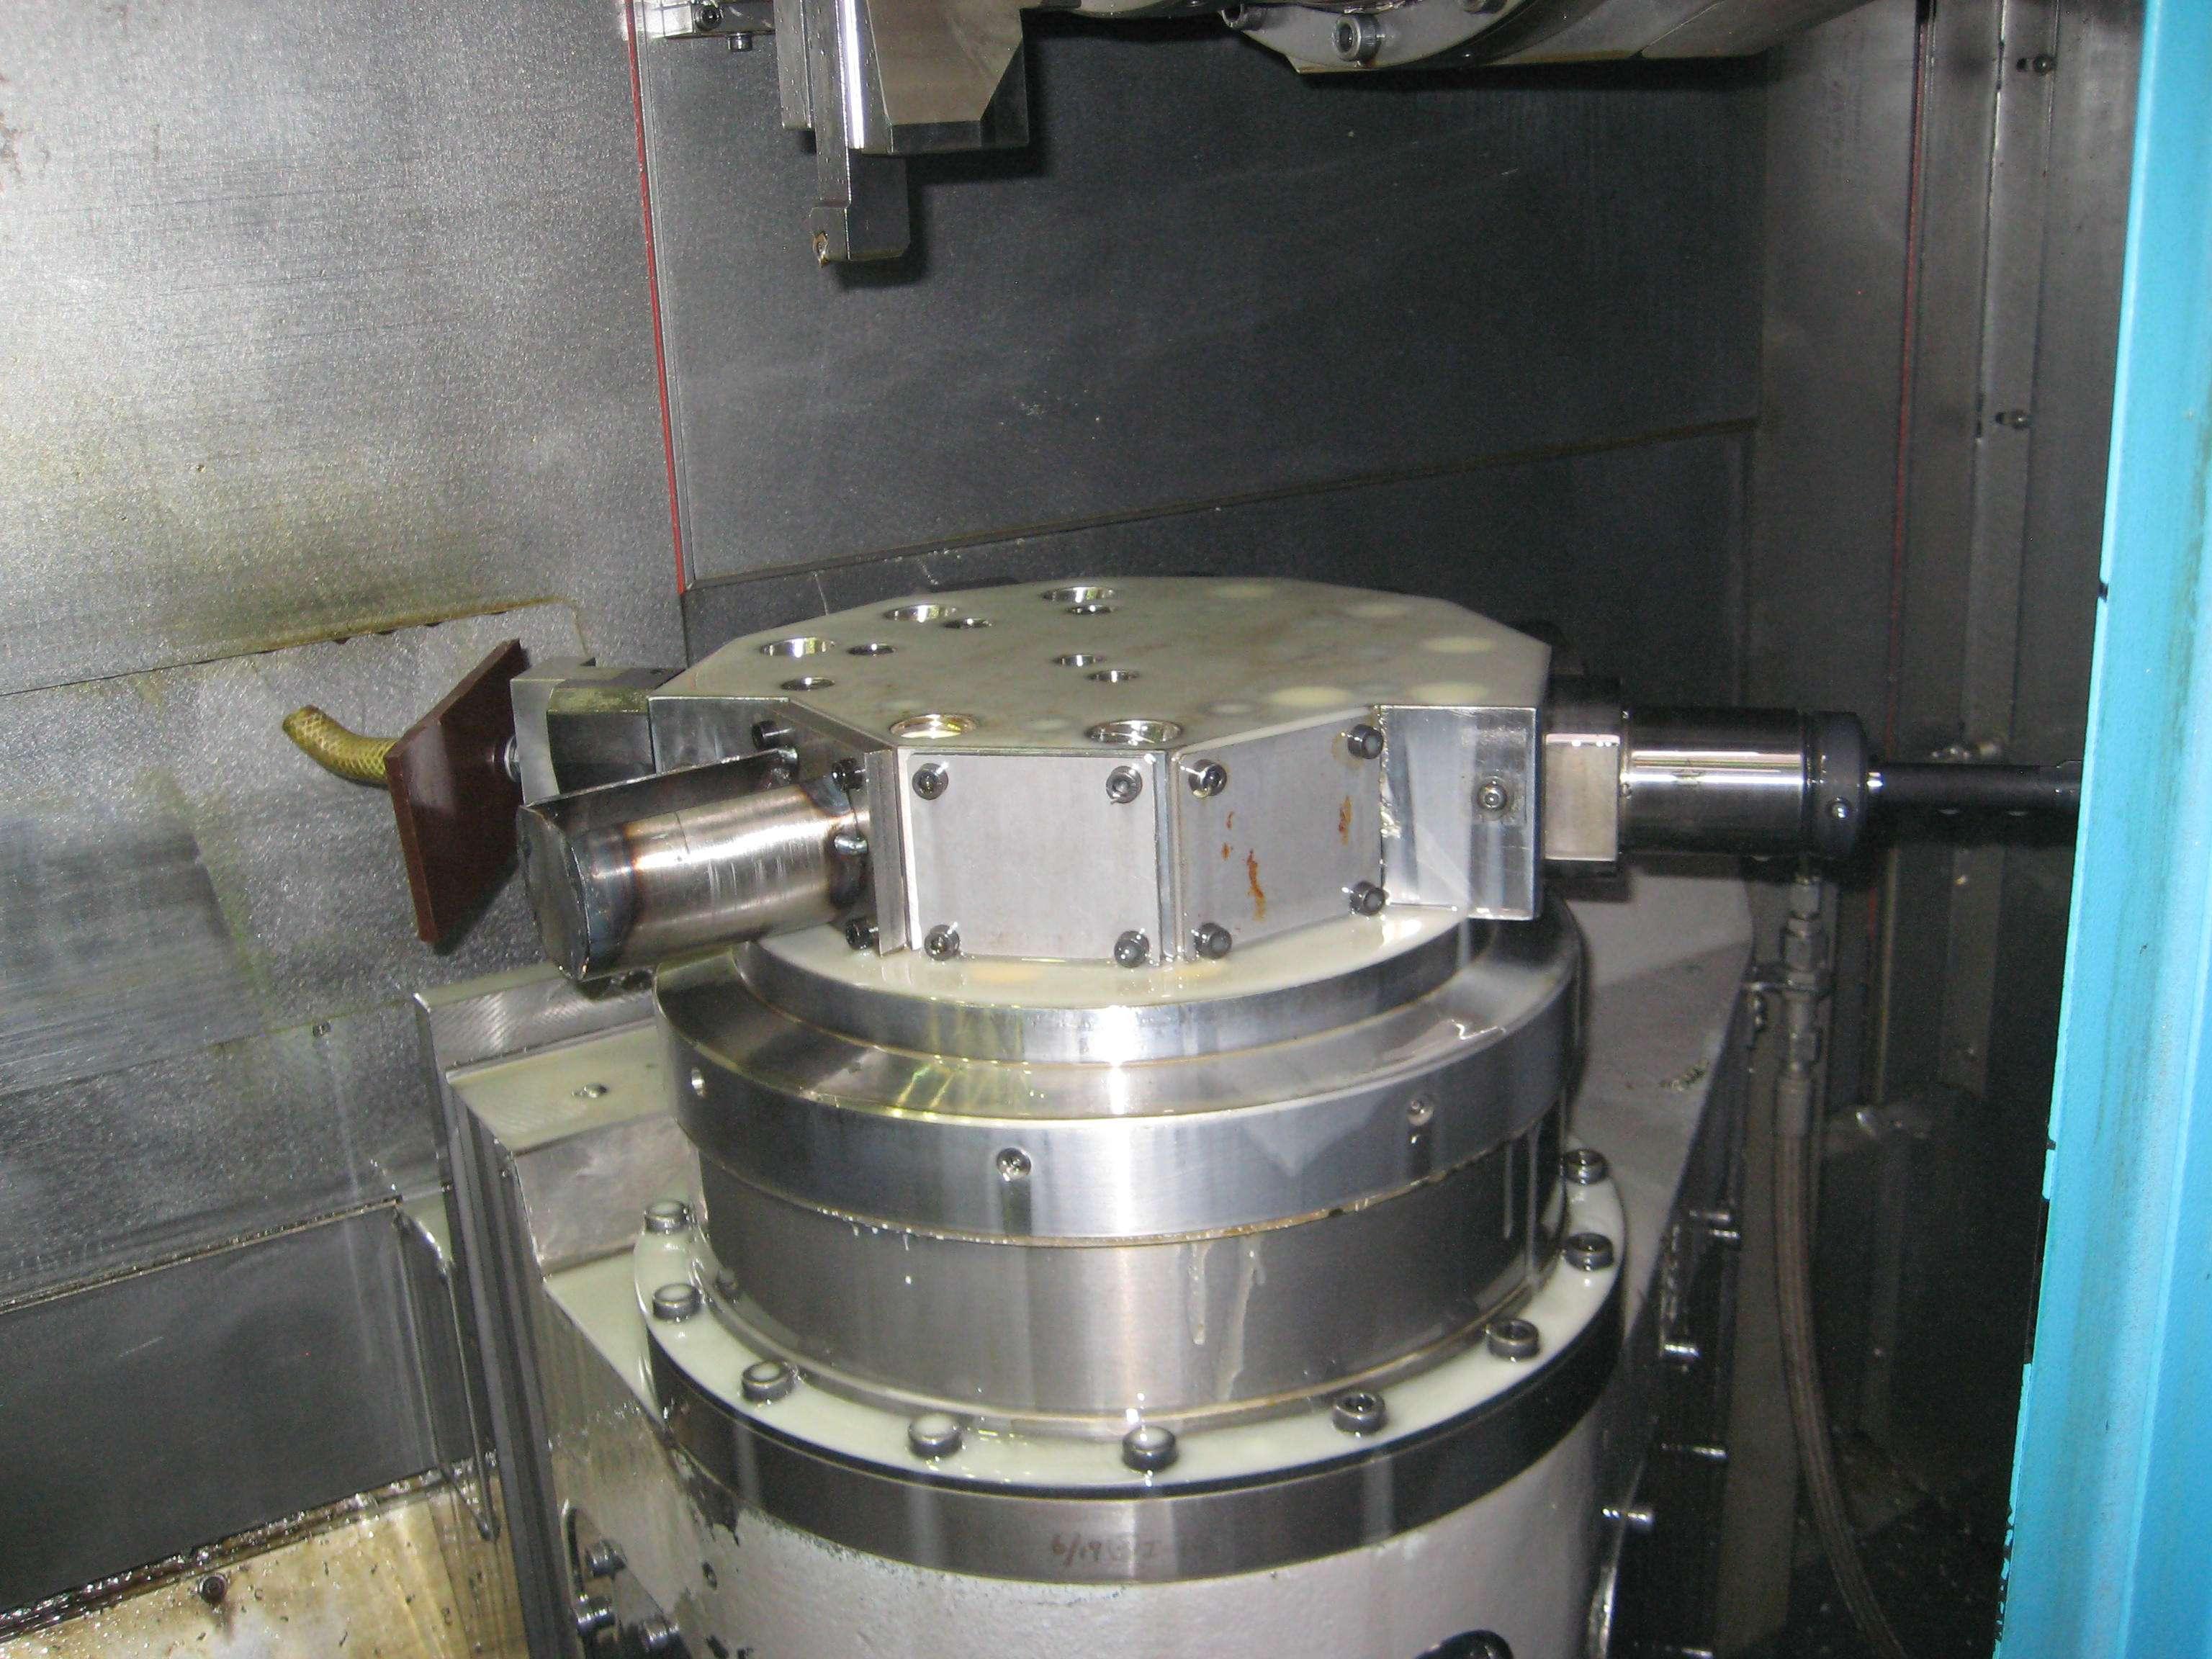 CNC Turning and Milling Machine CNC Dreh-, Fräsmaschine фото на Industry-Pilot